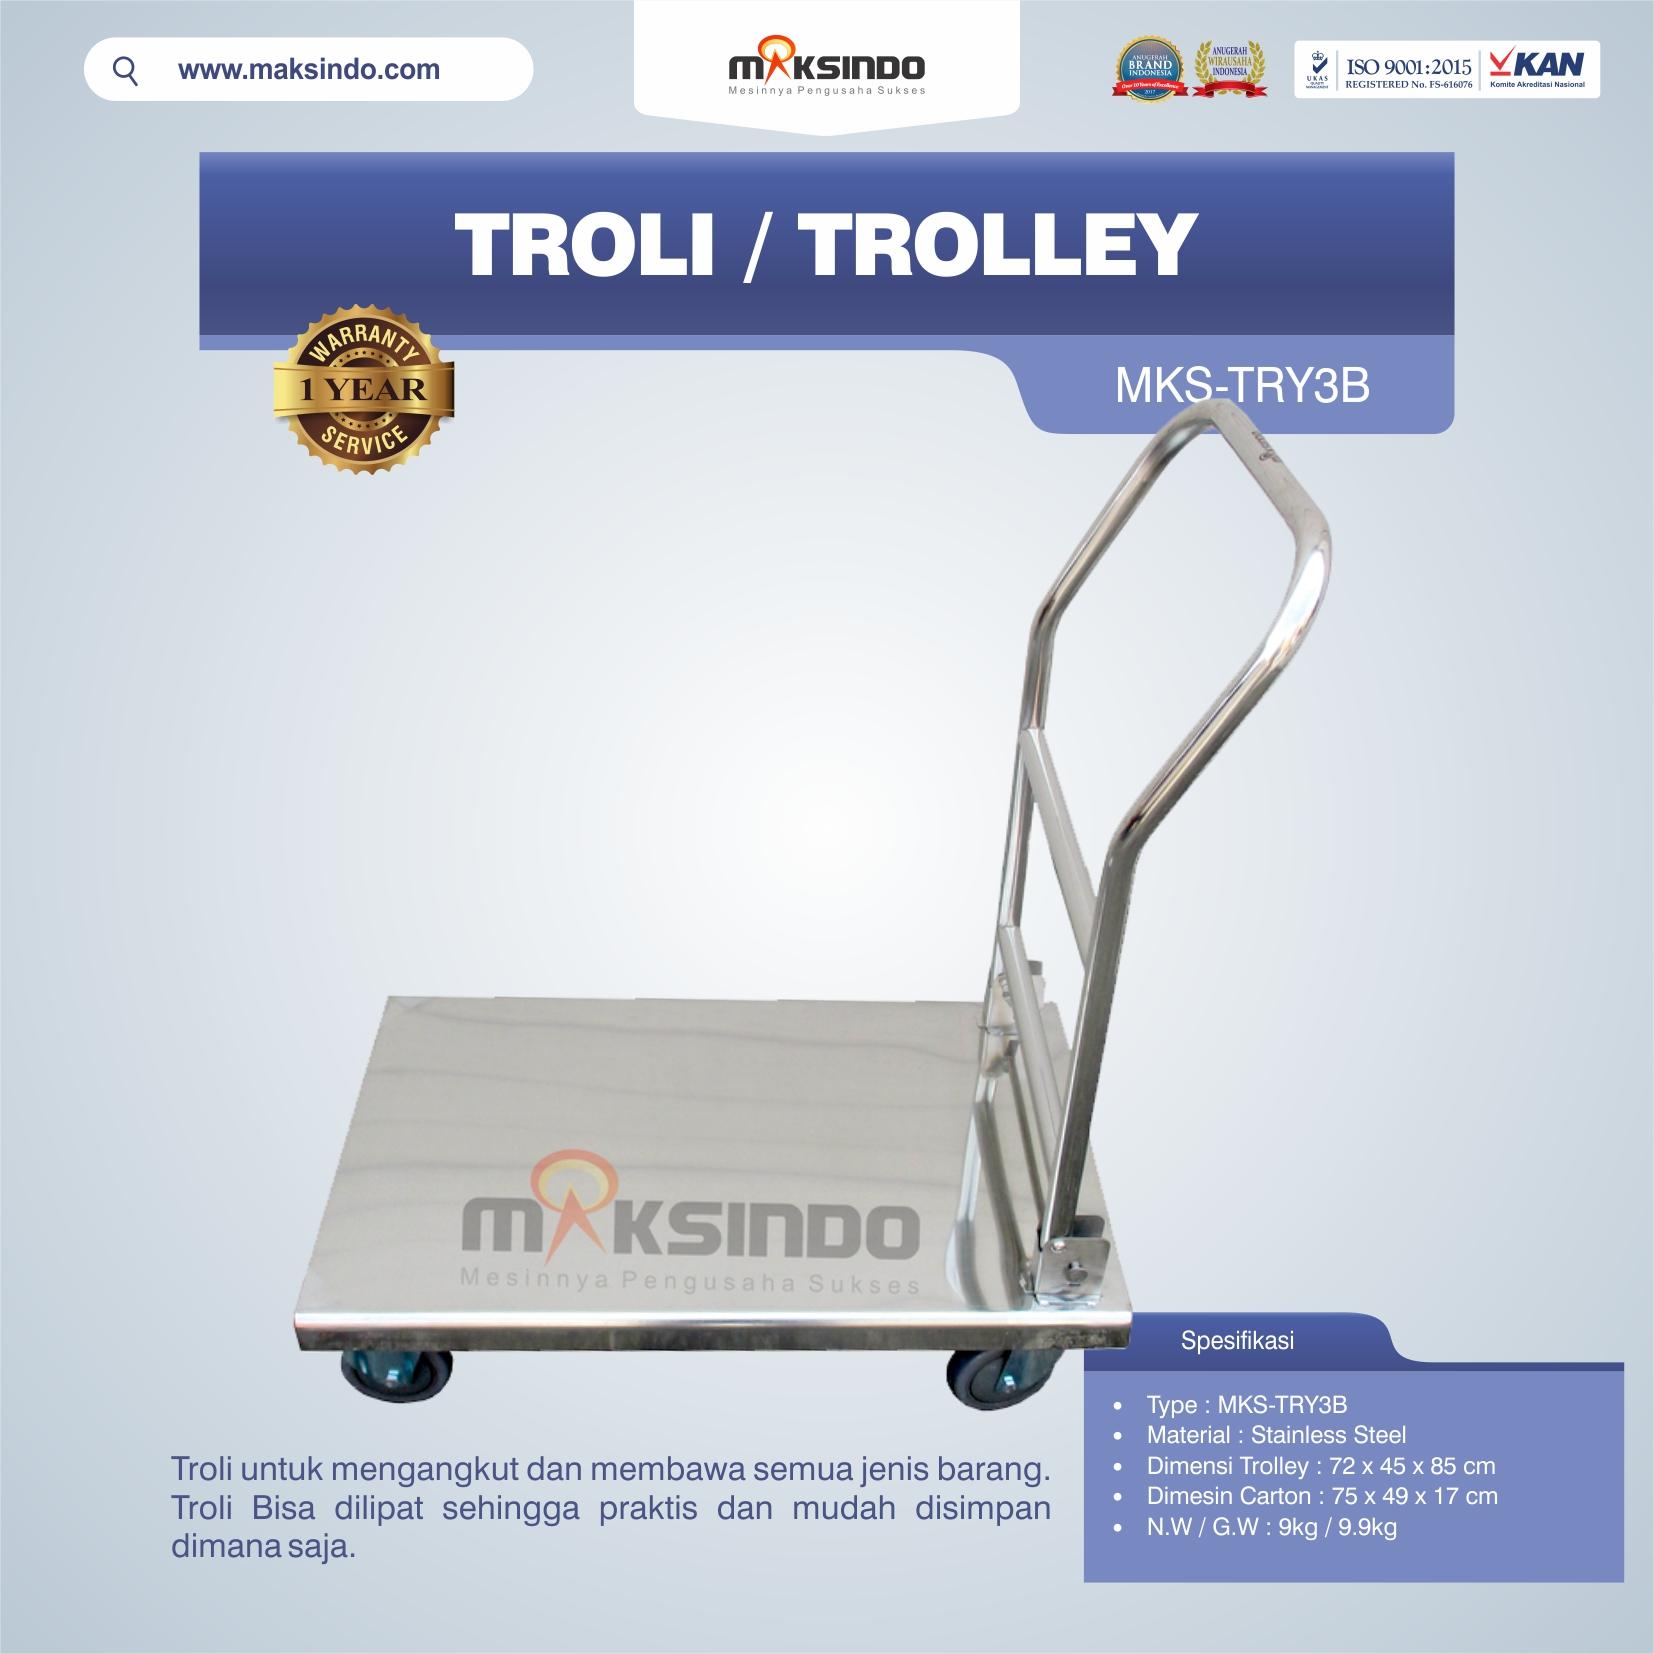 Jual Troli/Trolley MKS-TRY3B di Blitar